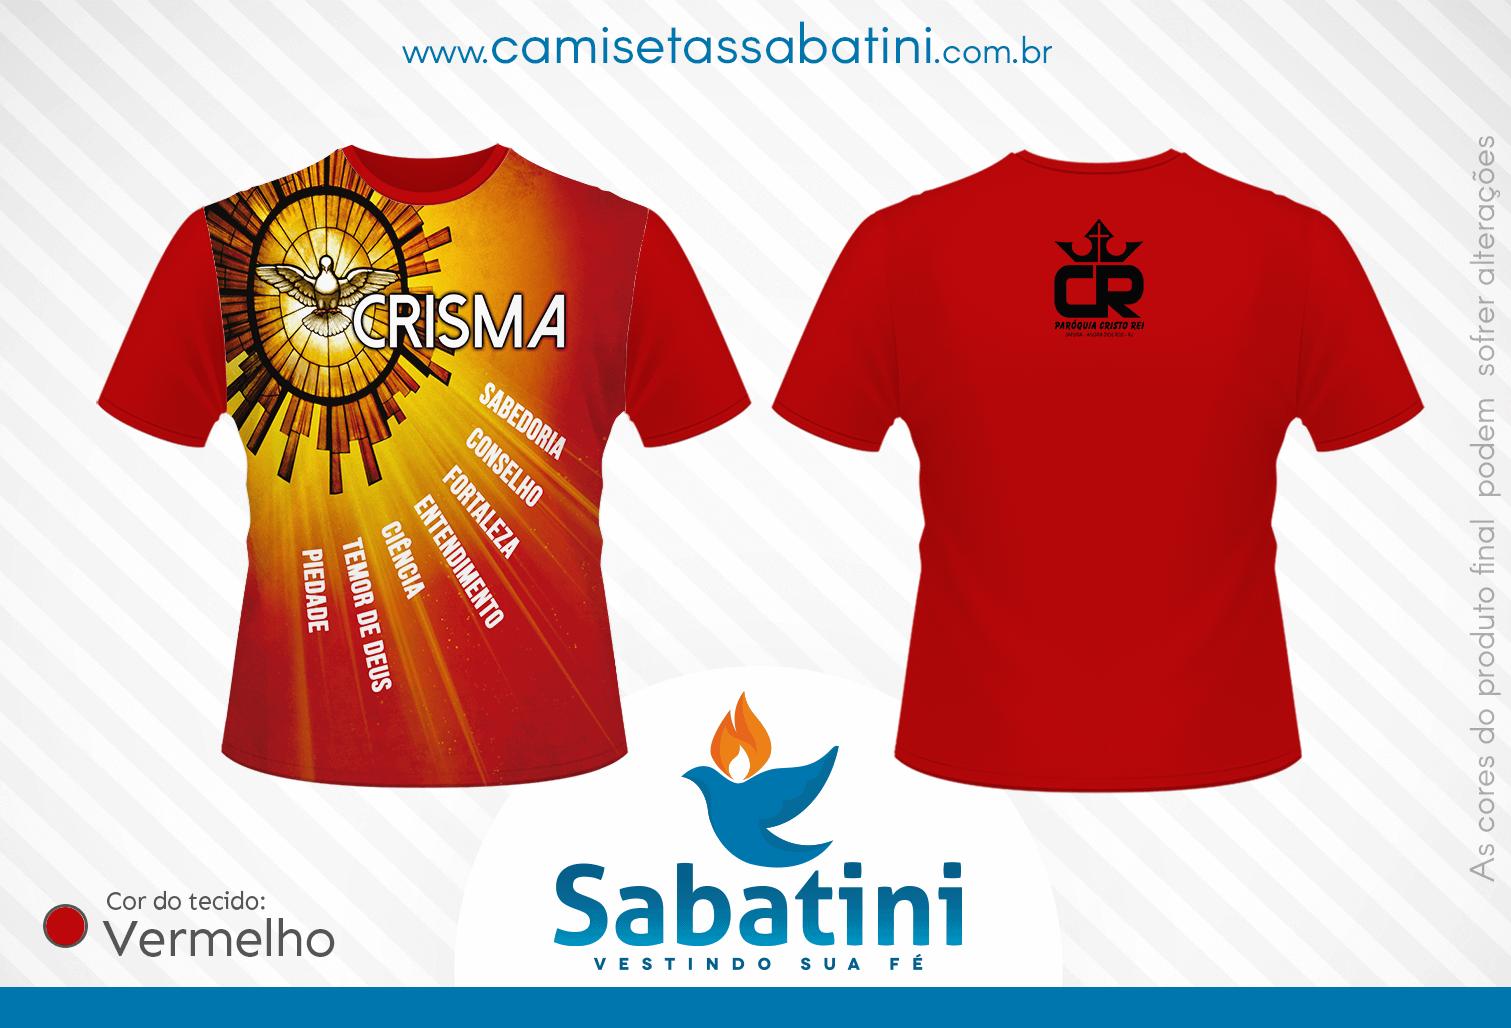 Camiseta Personalizada - CRISMA - PARÓQUIA CRISTO REI -  ANGRA DOS REIS - RJ - ID:15461920  - Camisetas Sabatini